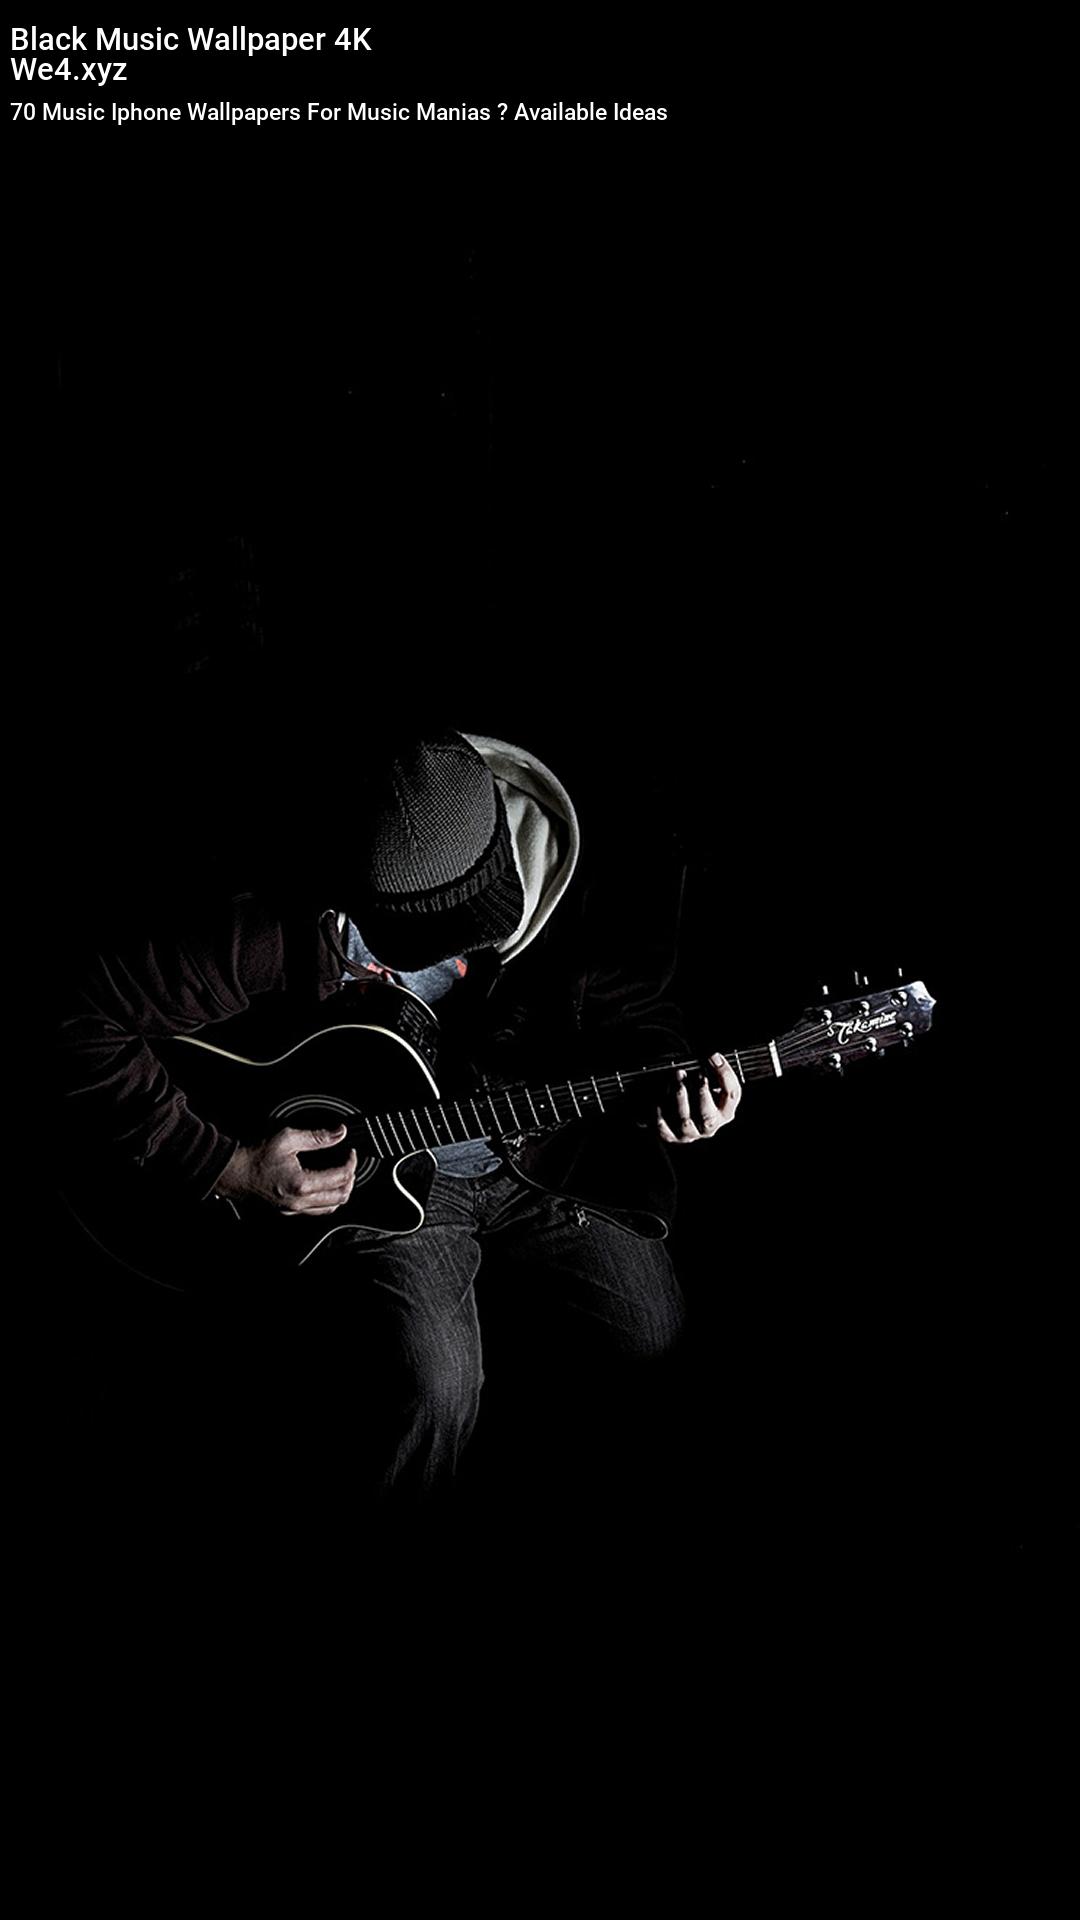 Black Music Wallpaper 4k Iphone Music Music Wallpaper Guitar Wallpaper Iphone